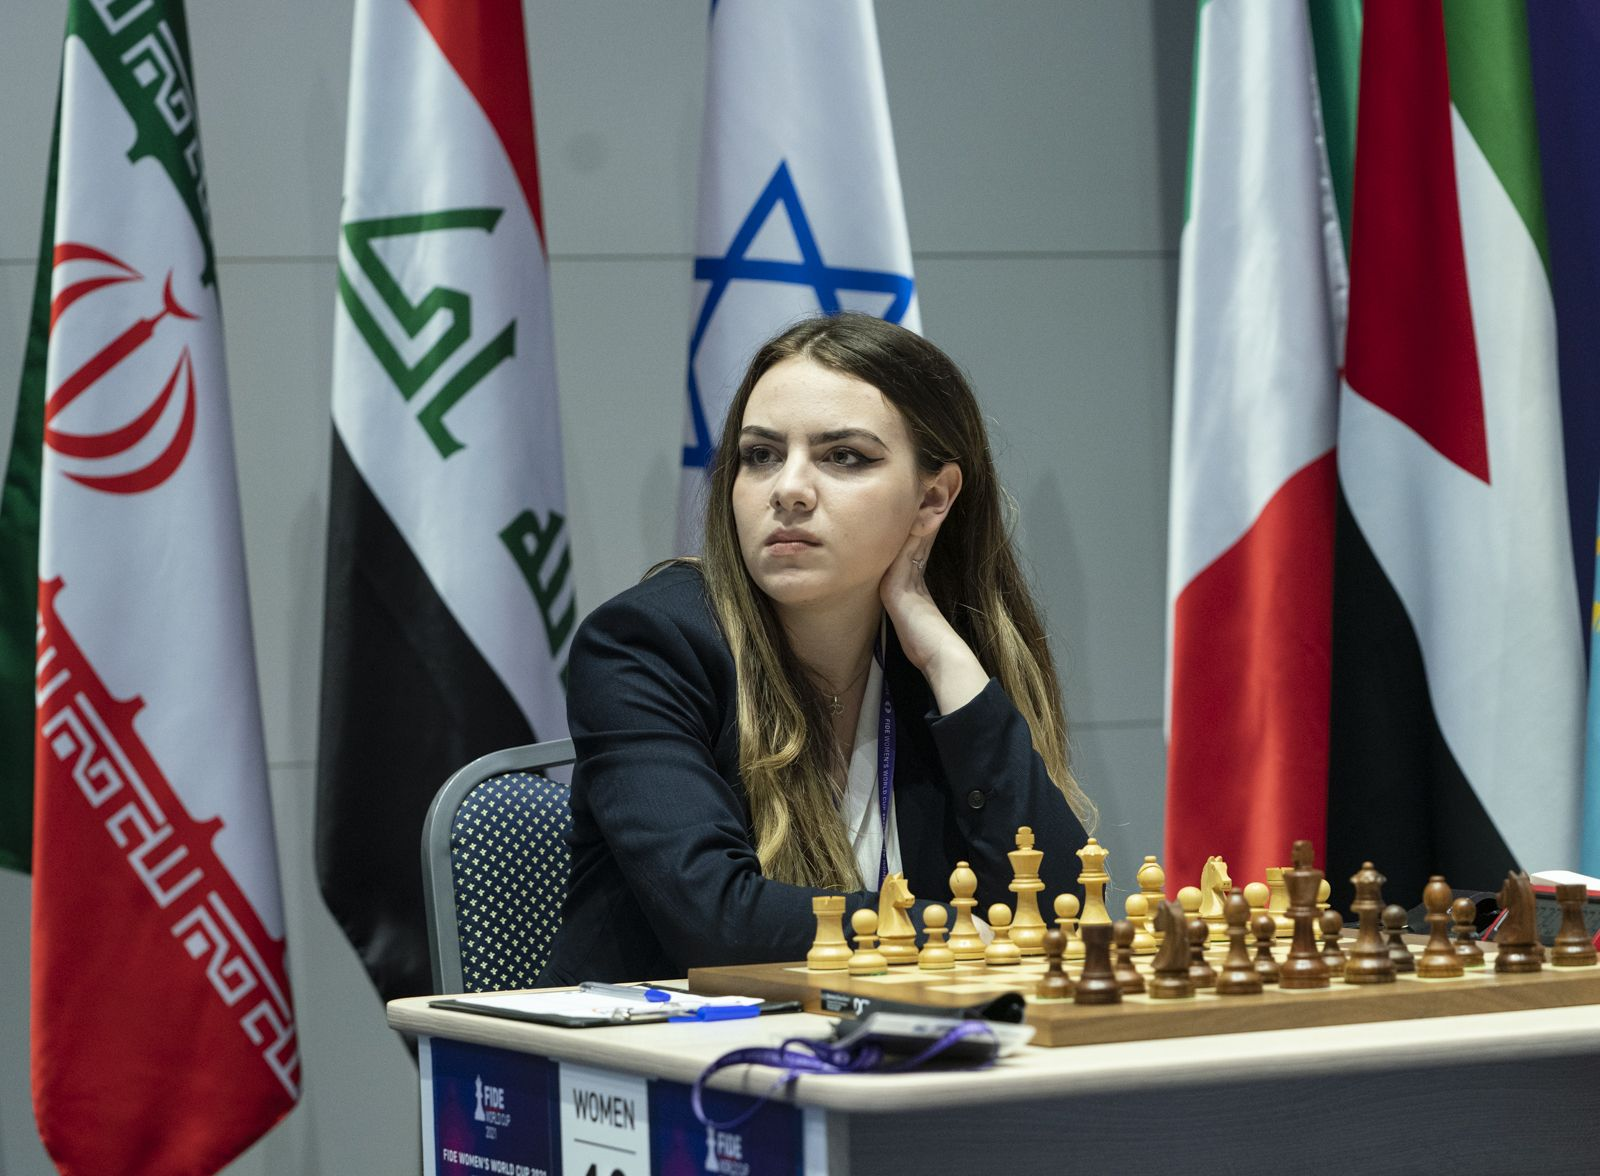 Nurgyul Salimova Bulgaria